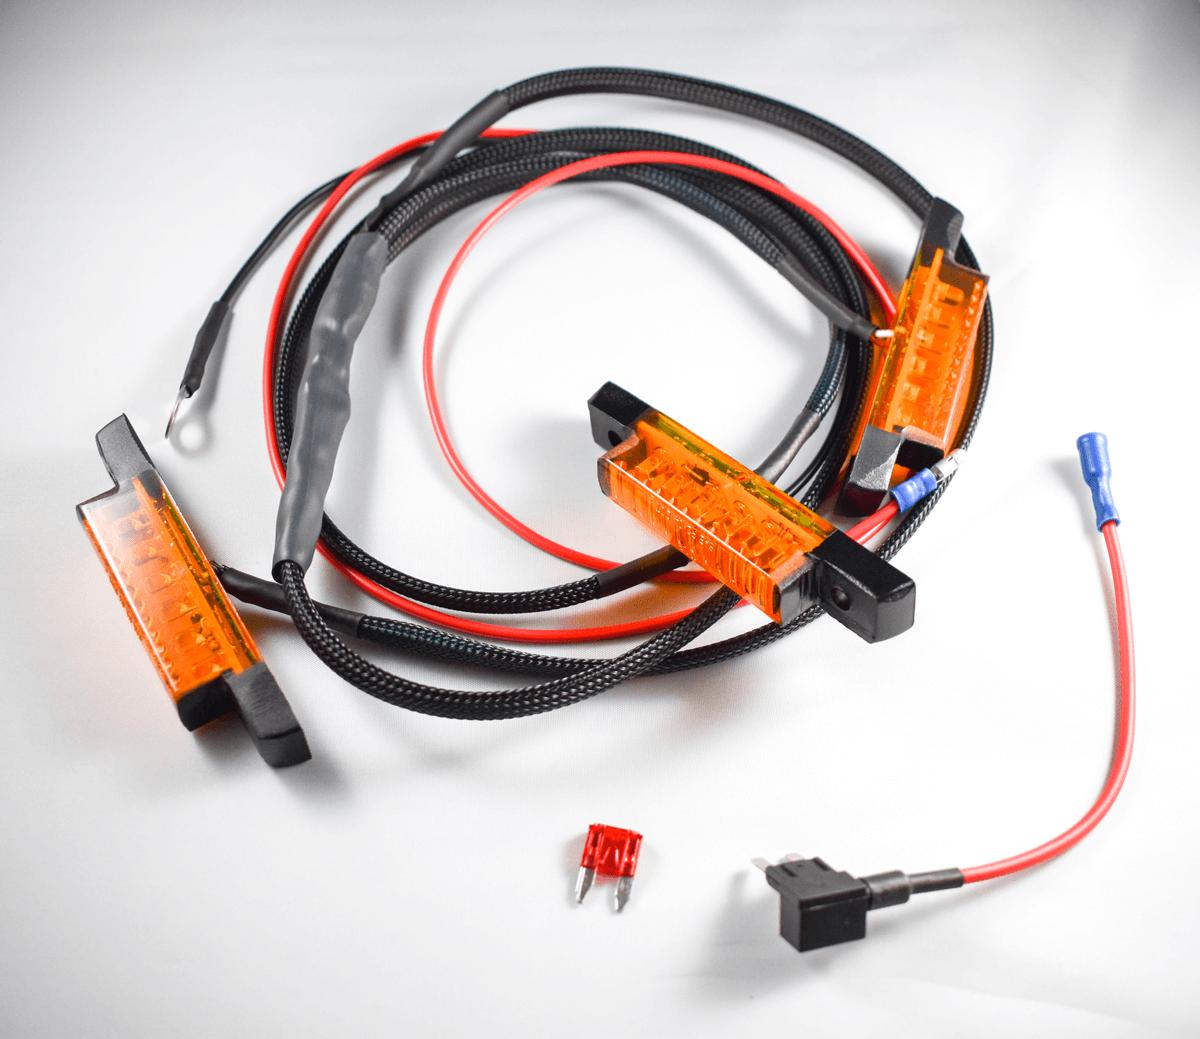 hight resolution of amber leamber led 4runner d wiring harness toyota 4runner grill